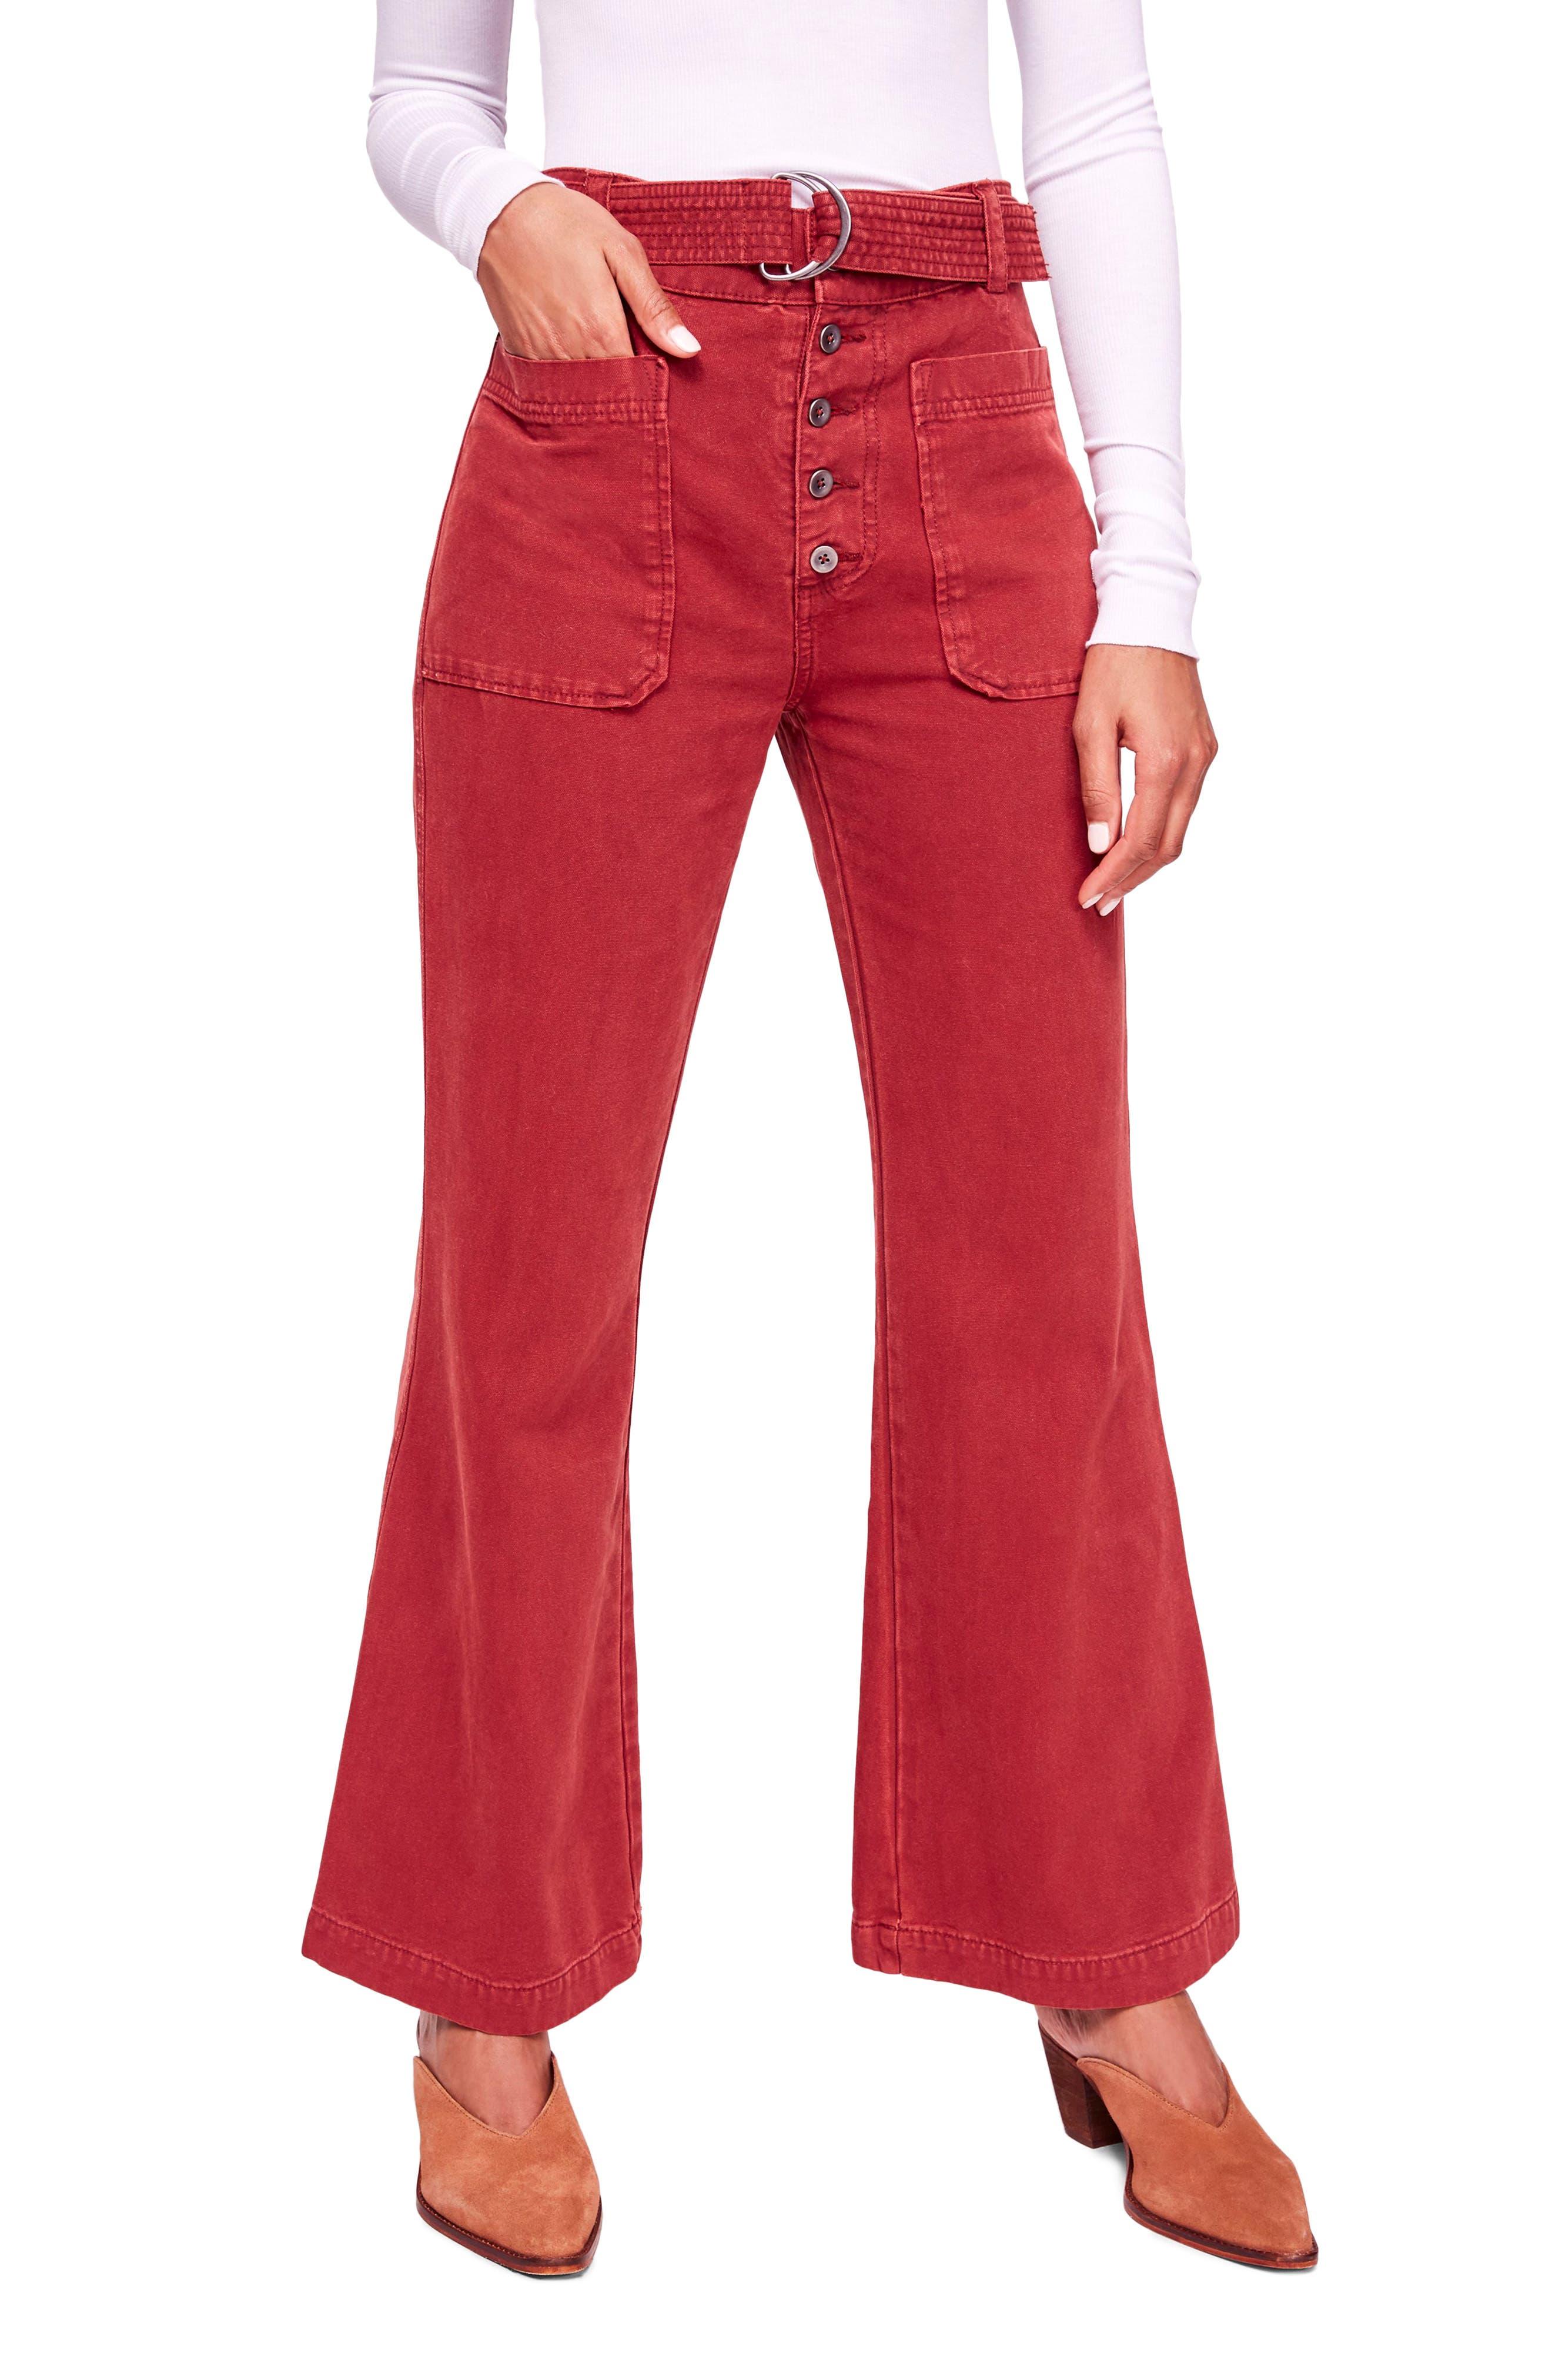 Corin Mod Slim Flare Pants,                         Main,                         color, WINE